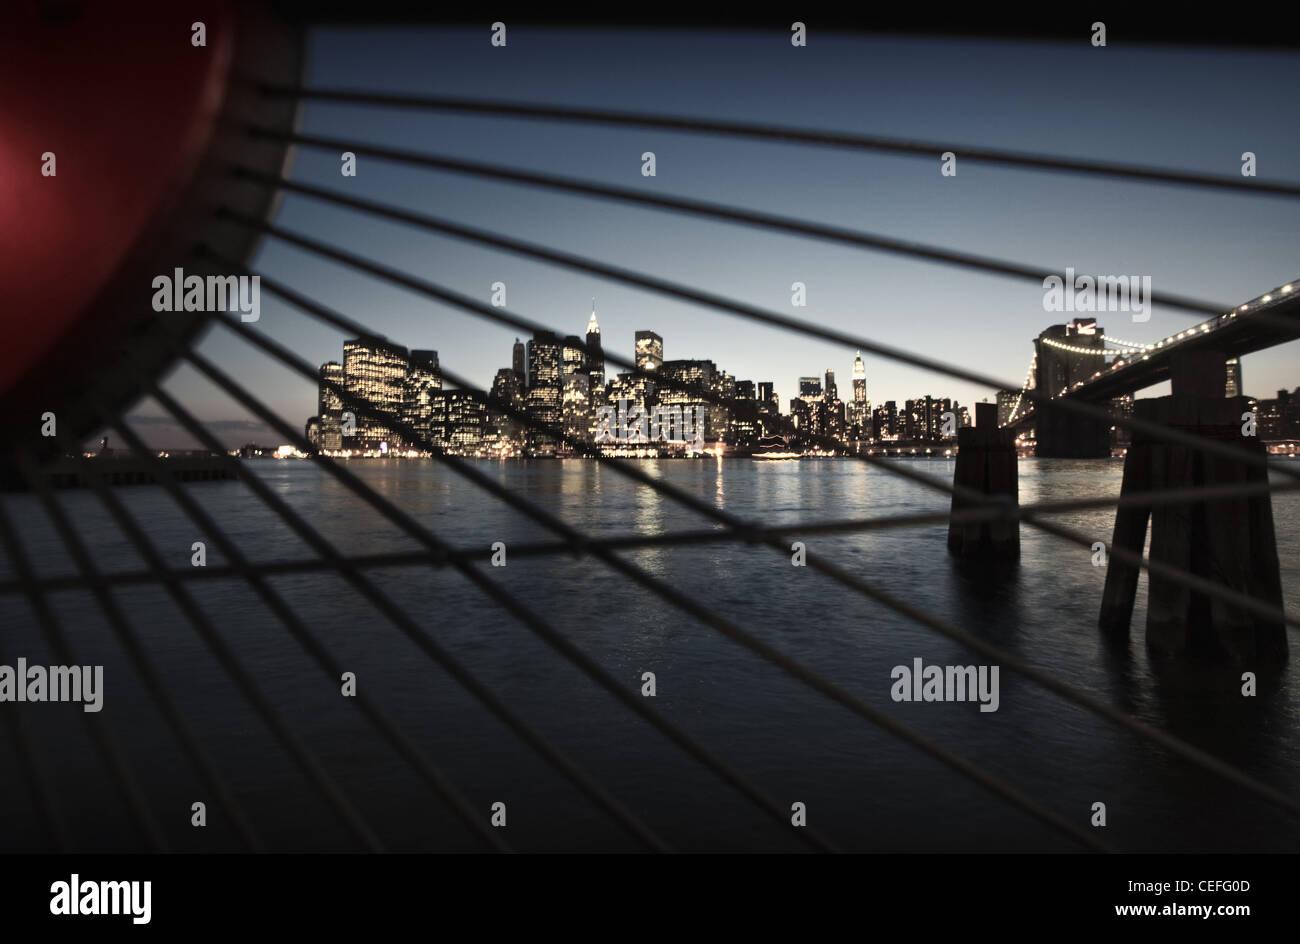 Manhattan skyline lit up at night - Stock Image